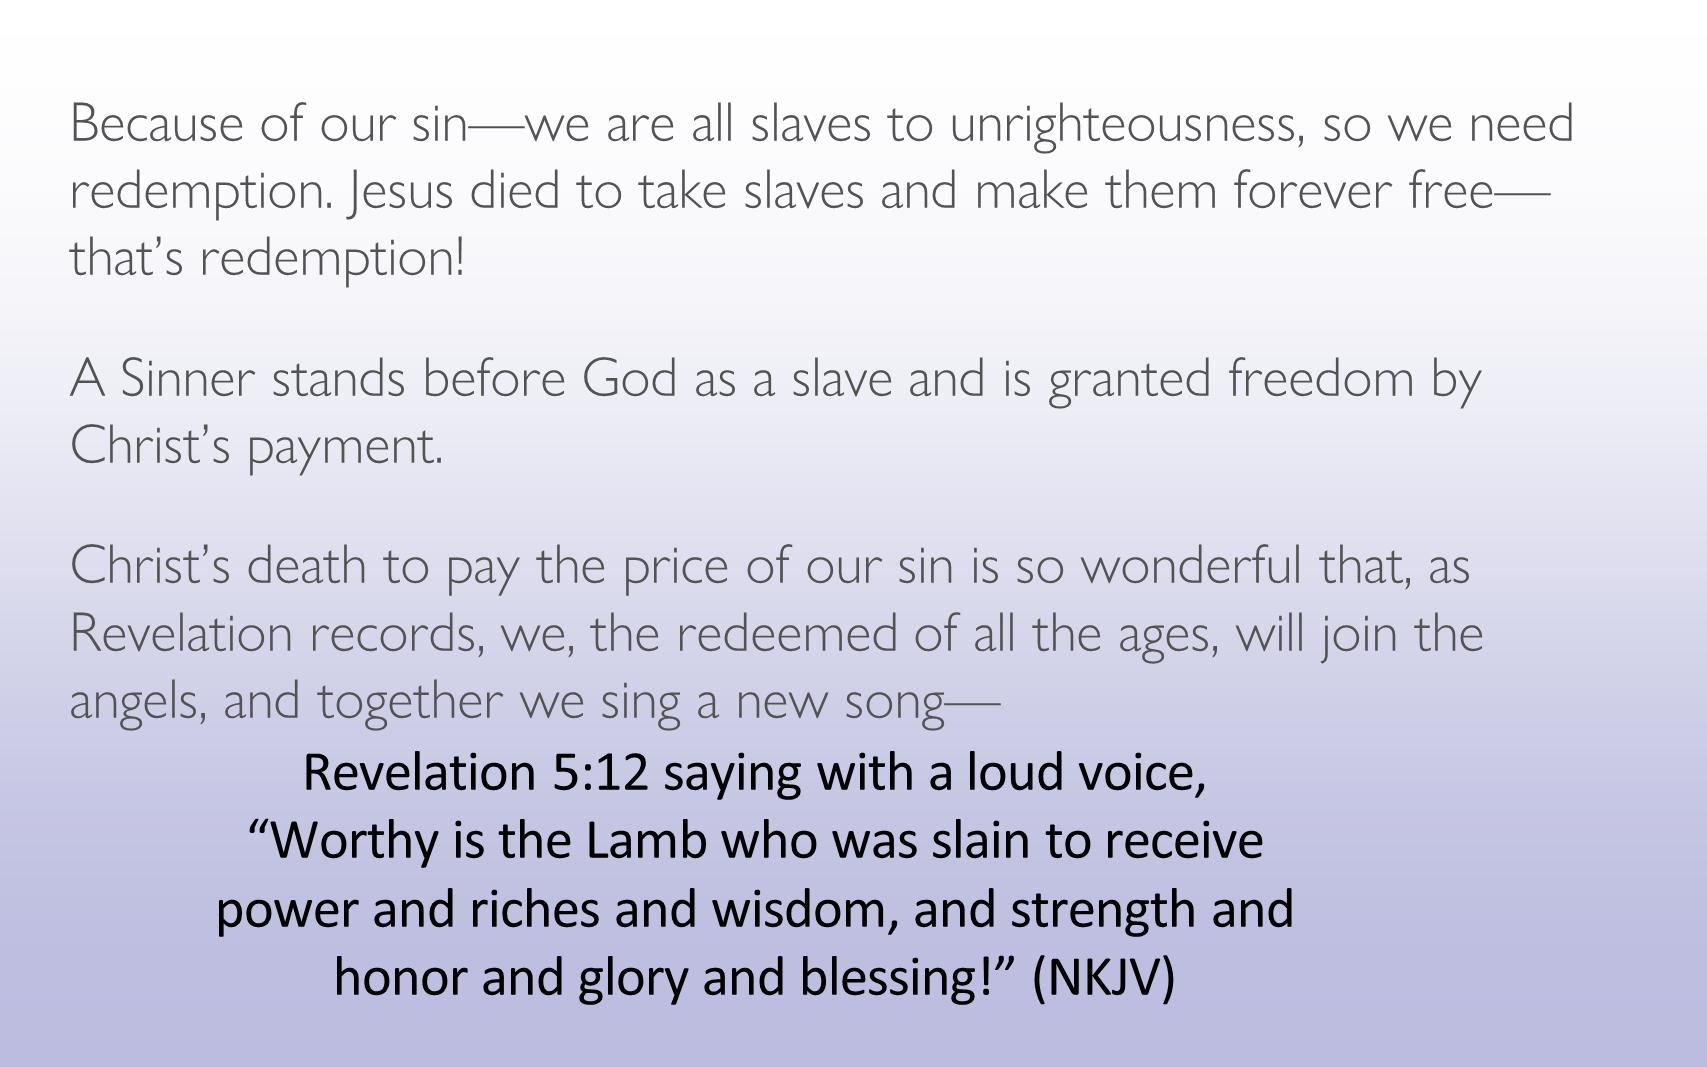 WCC-03 - Proclaiming Christ's Cross Regularly (15)